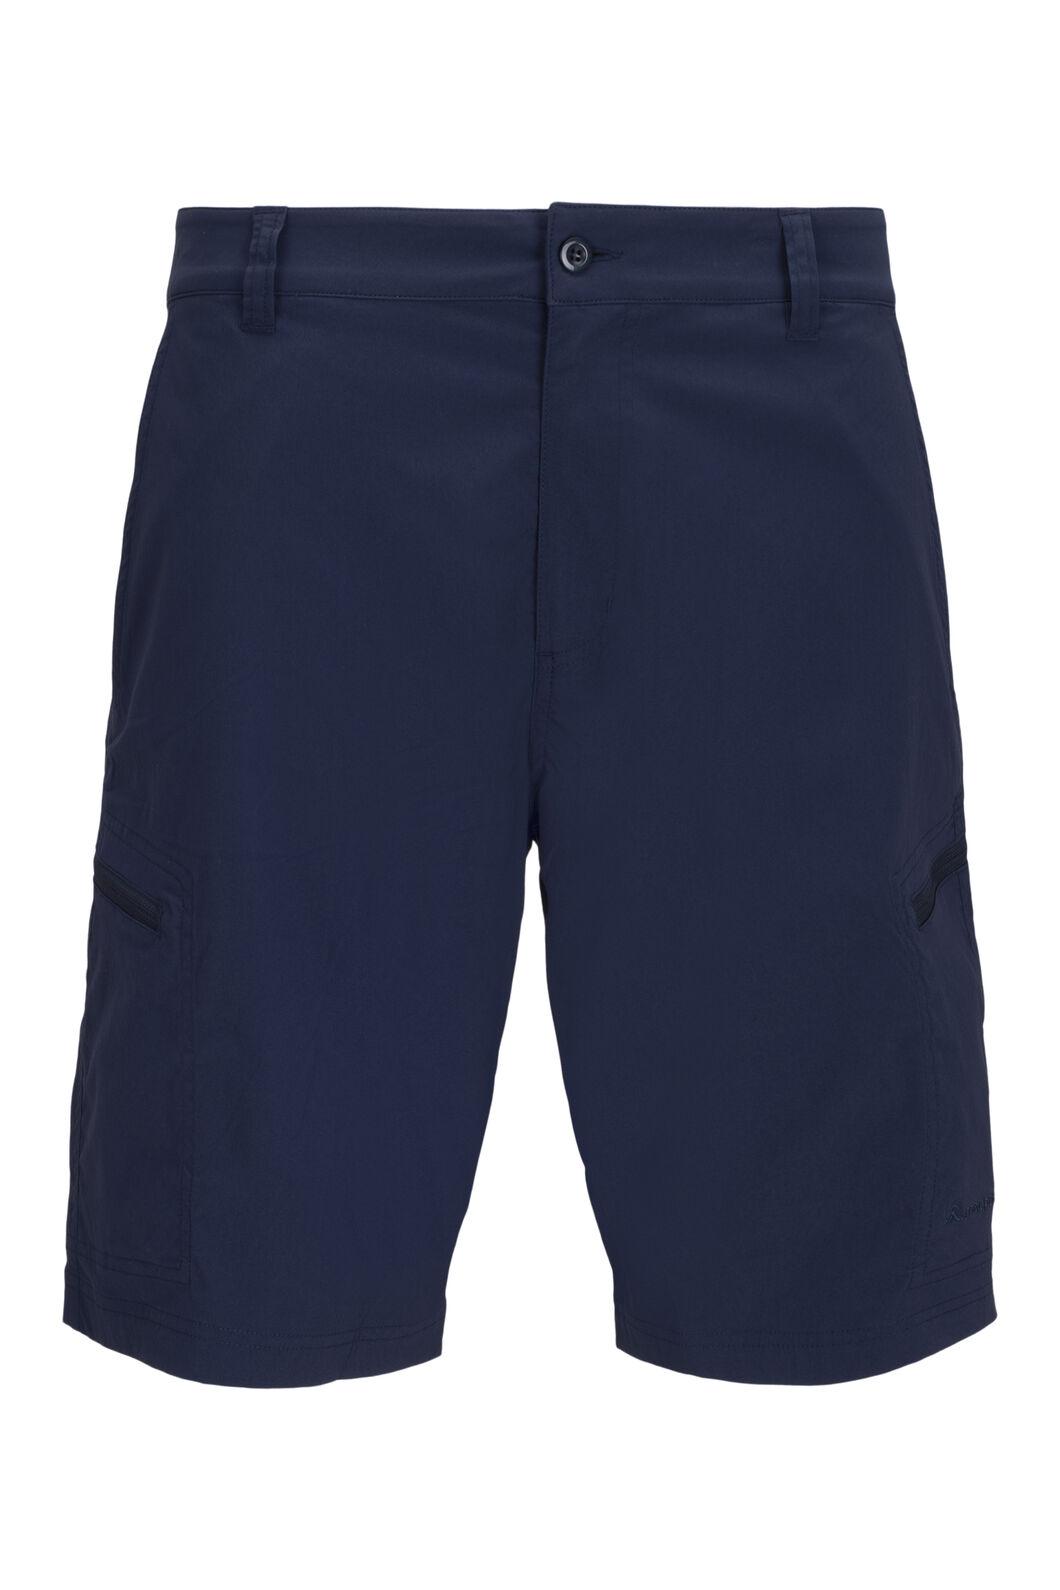 Macpac Men's Drift Shorts, Black Iris, hi-res